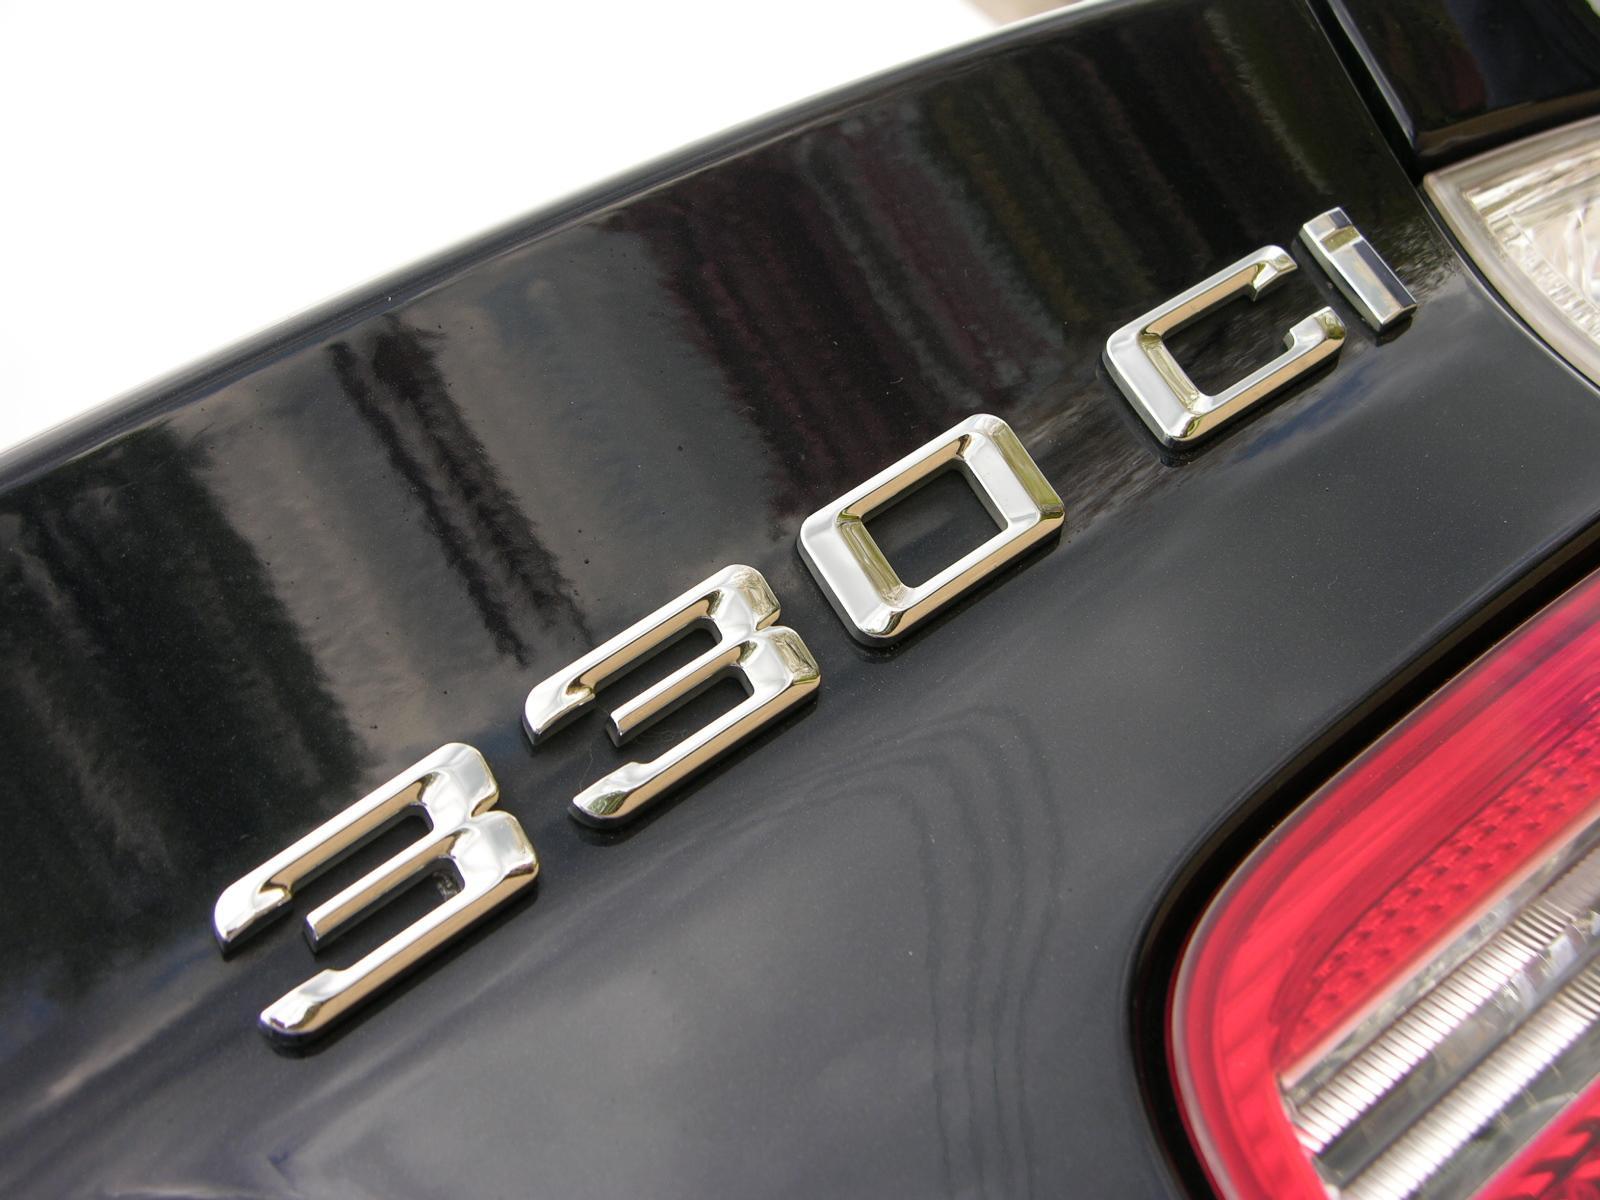 Bmw E46 330ci Ebay Ebayebay 330 325 Drift Kit Car Wiring Loom Electronics Cars Fashion 2016 Release Wide Diagrams U2022